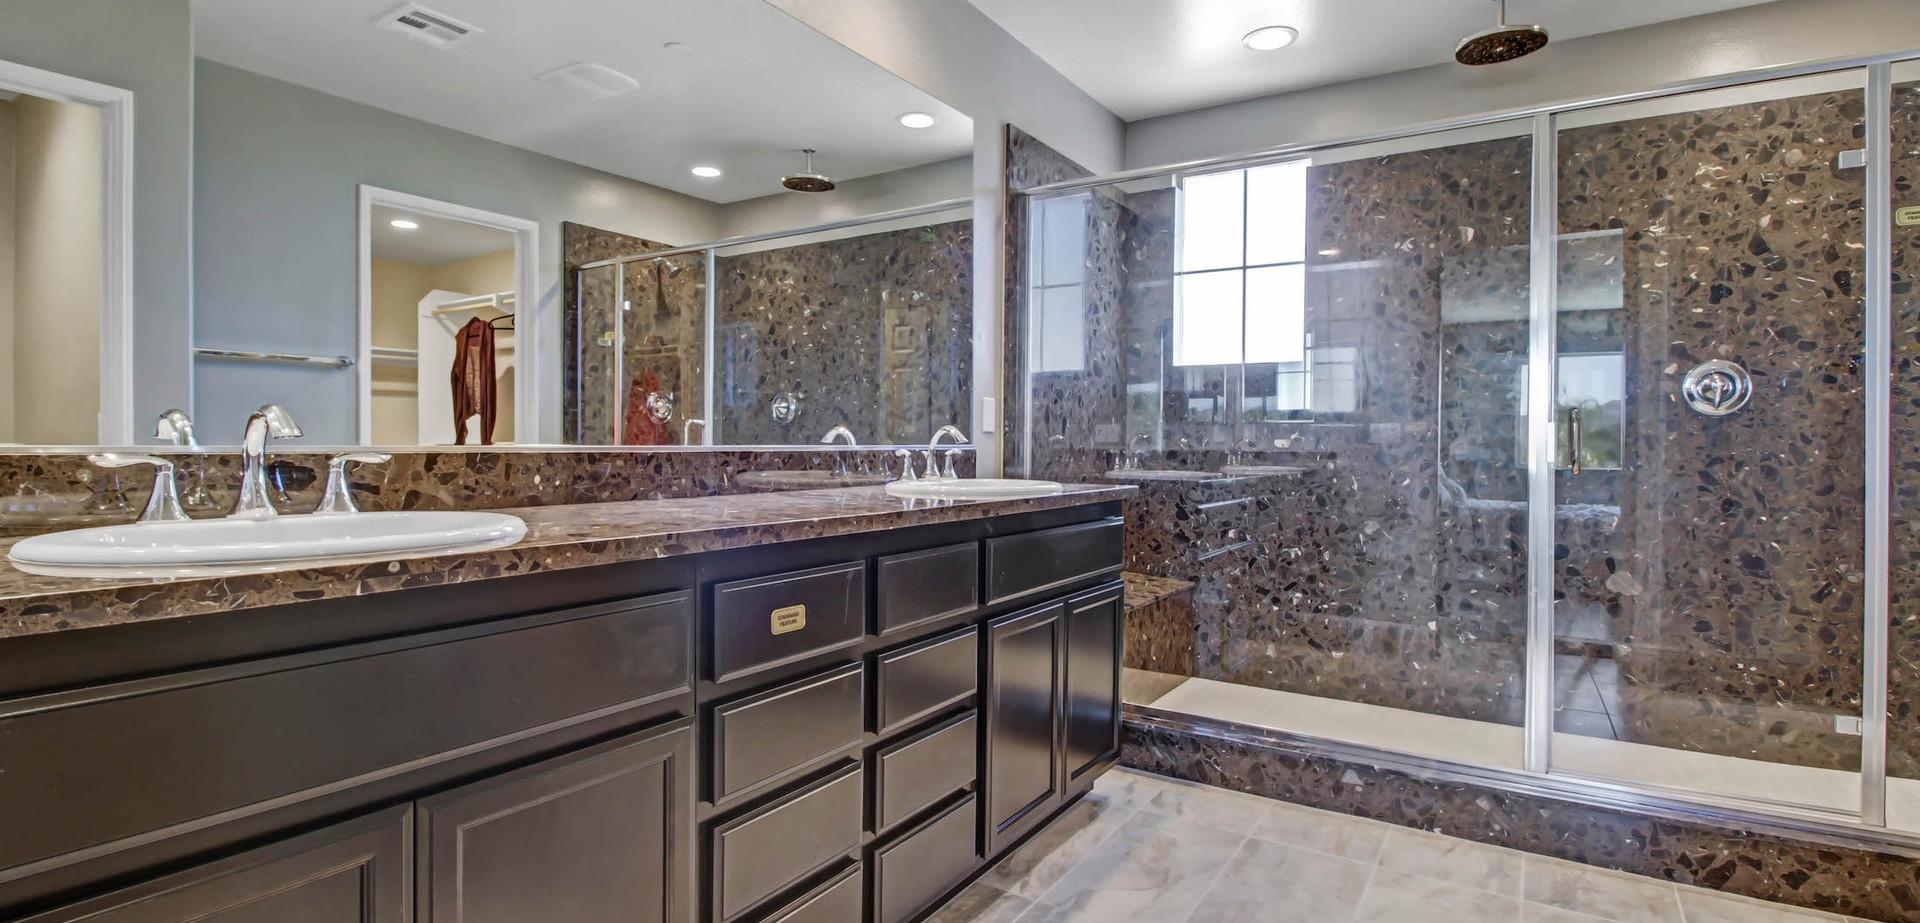 model-1 bathroom-3 2200x1500.jpg